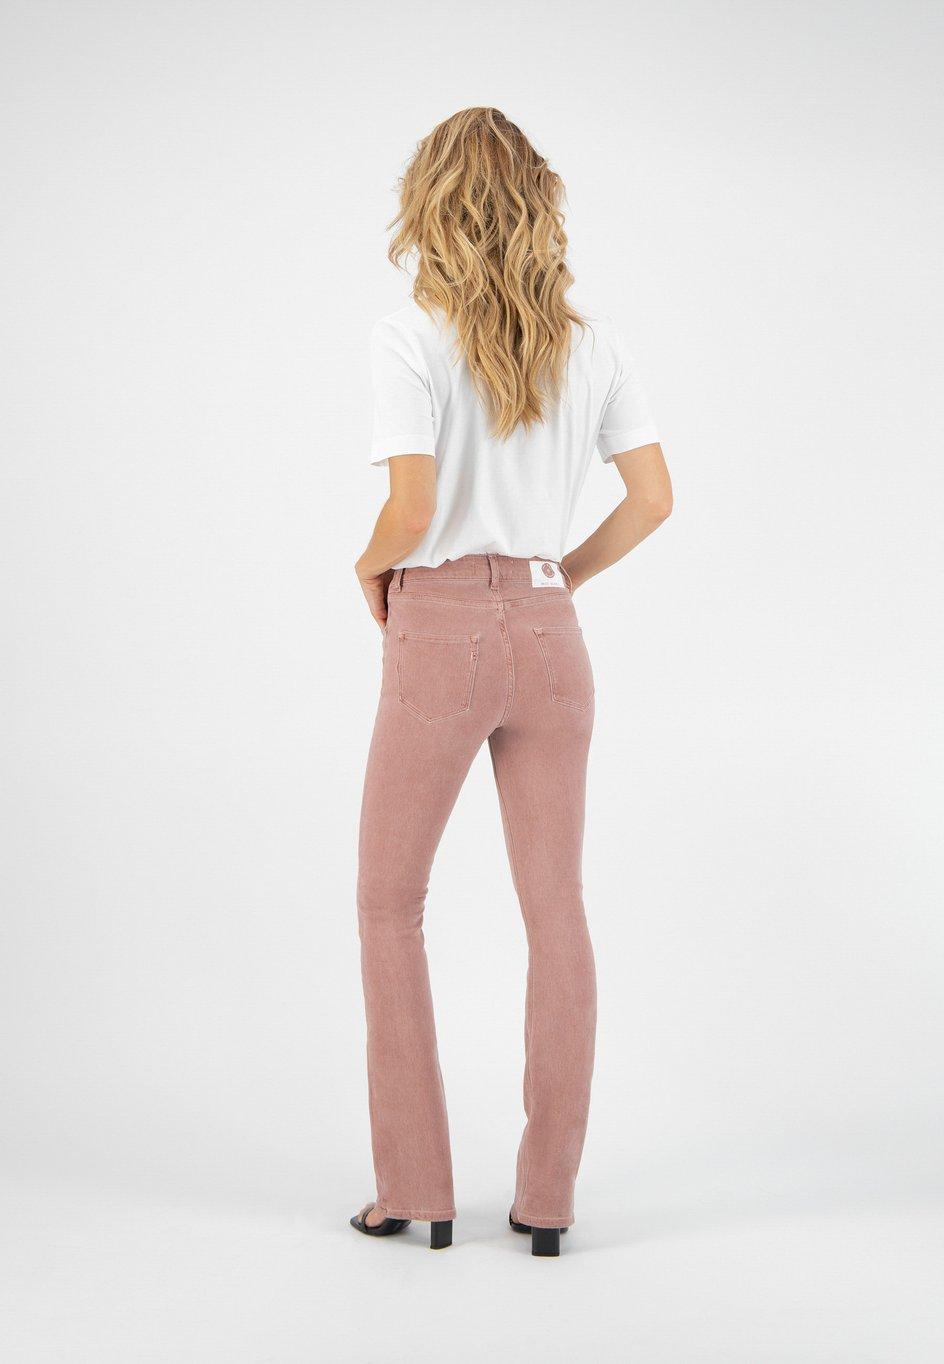 Woman-Eco-Jeans-Flared-Hazen-Terra-Fullback_473x682@2x